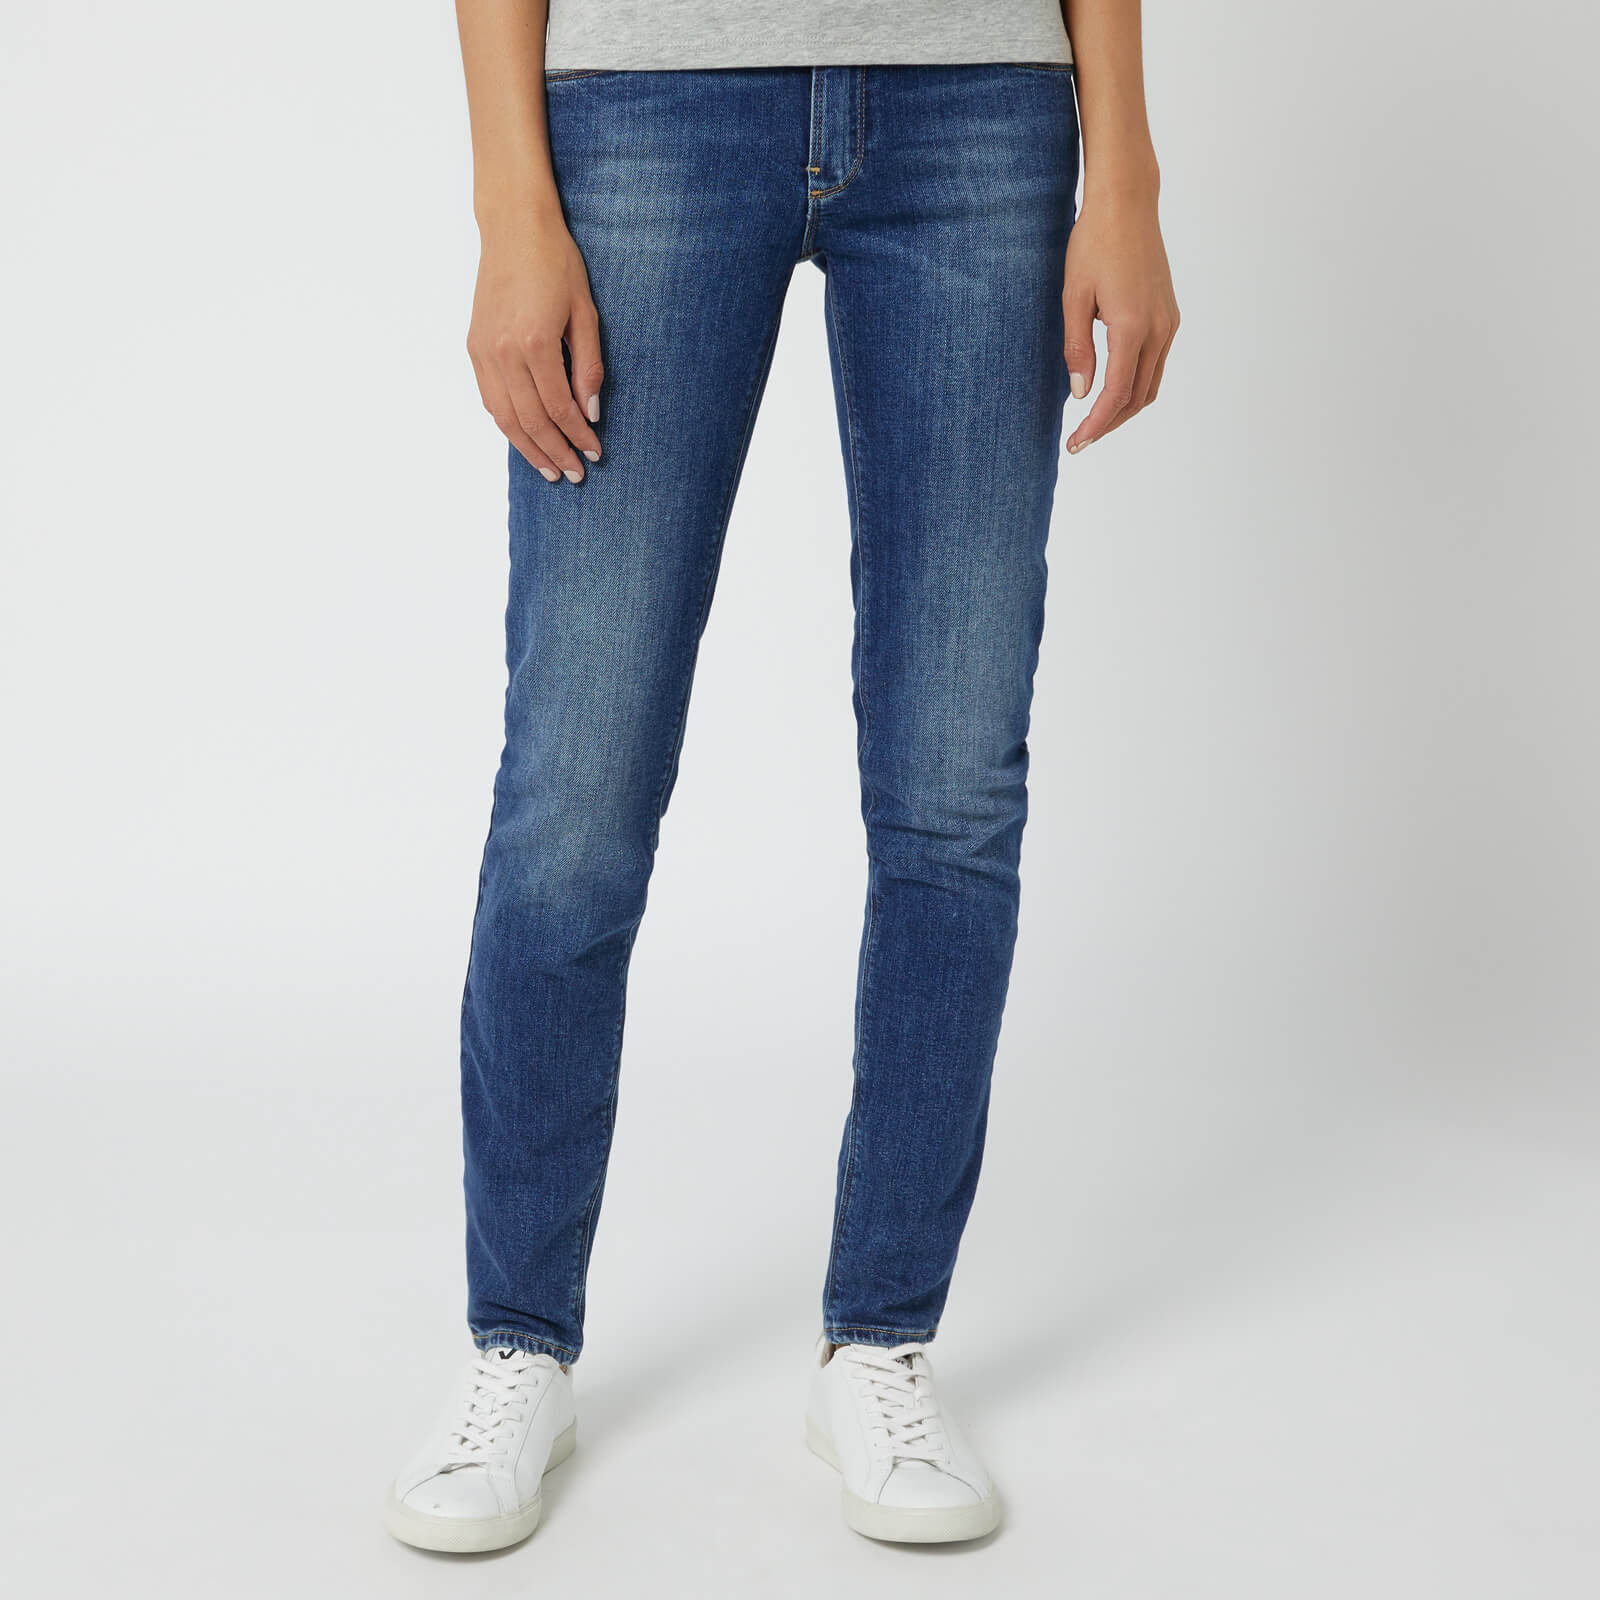 a9ef8390 Emporio Armani Women's J28 Mid Rise Skinny Jeans - Blue